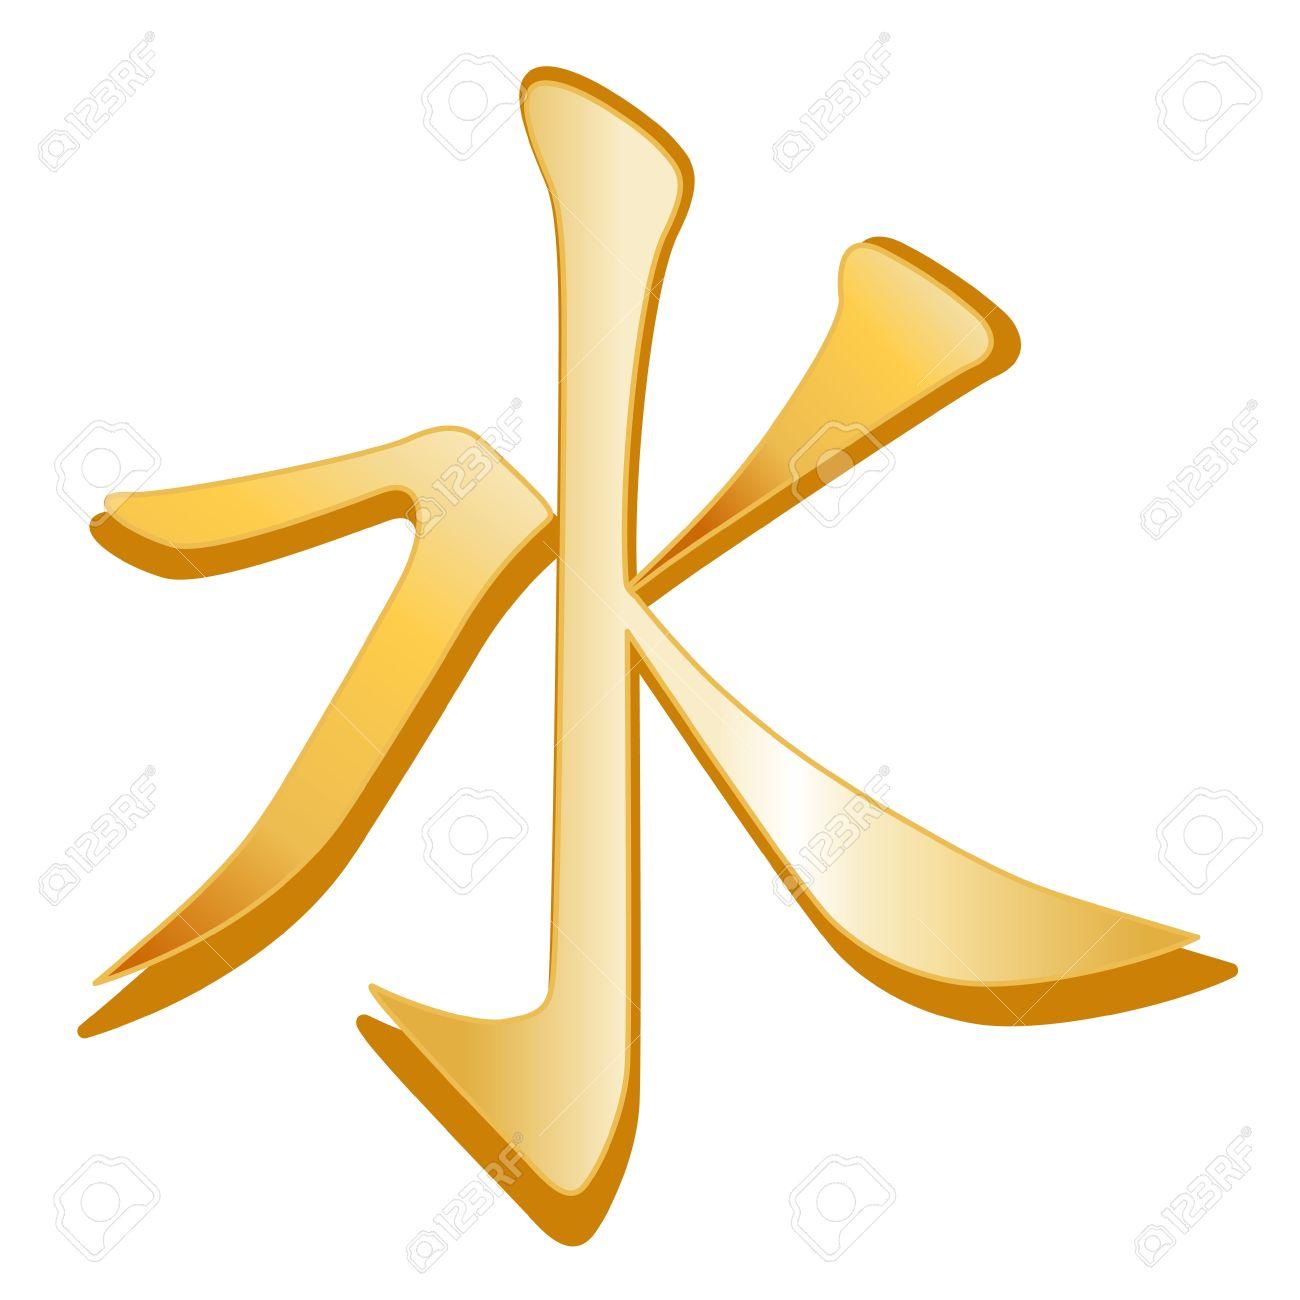 Confucianism symbol golden symbol of confucian faith white confucianism symbol golden symbol of confucian faith white background stock vector 12392258 biocorpaavc Images